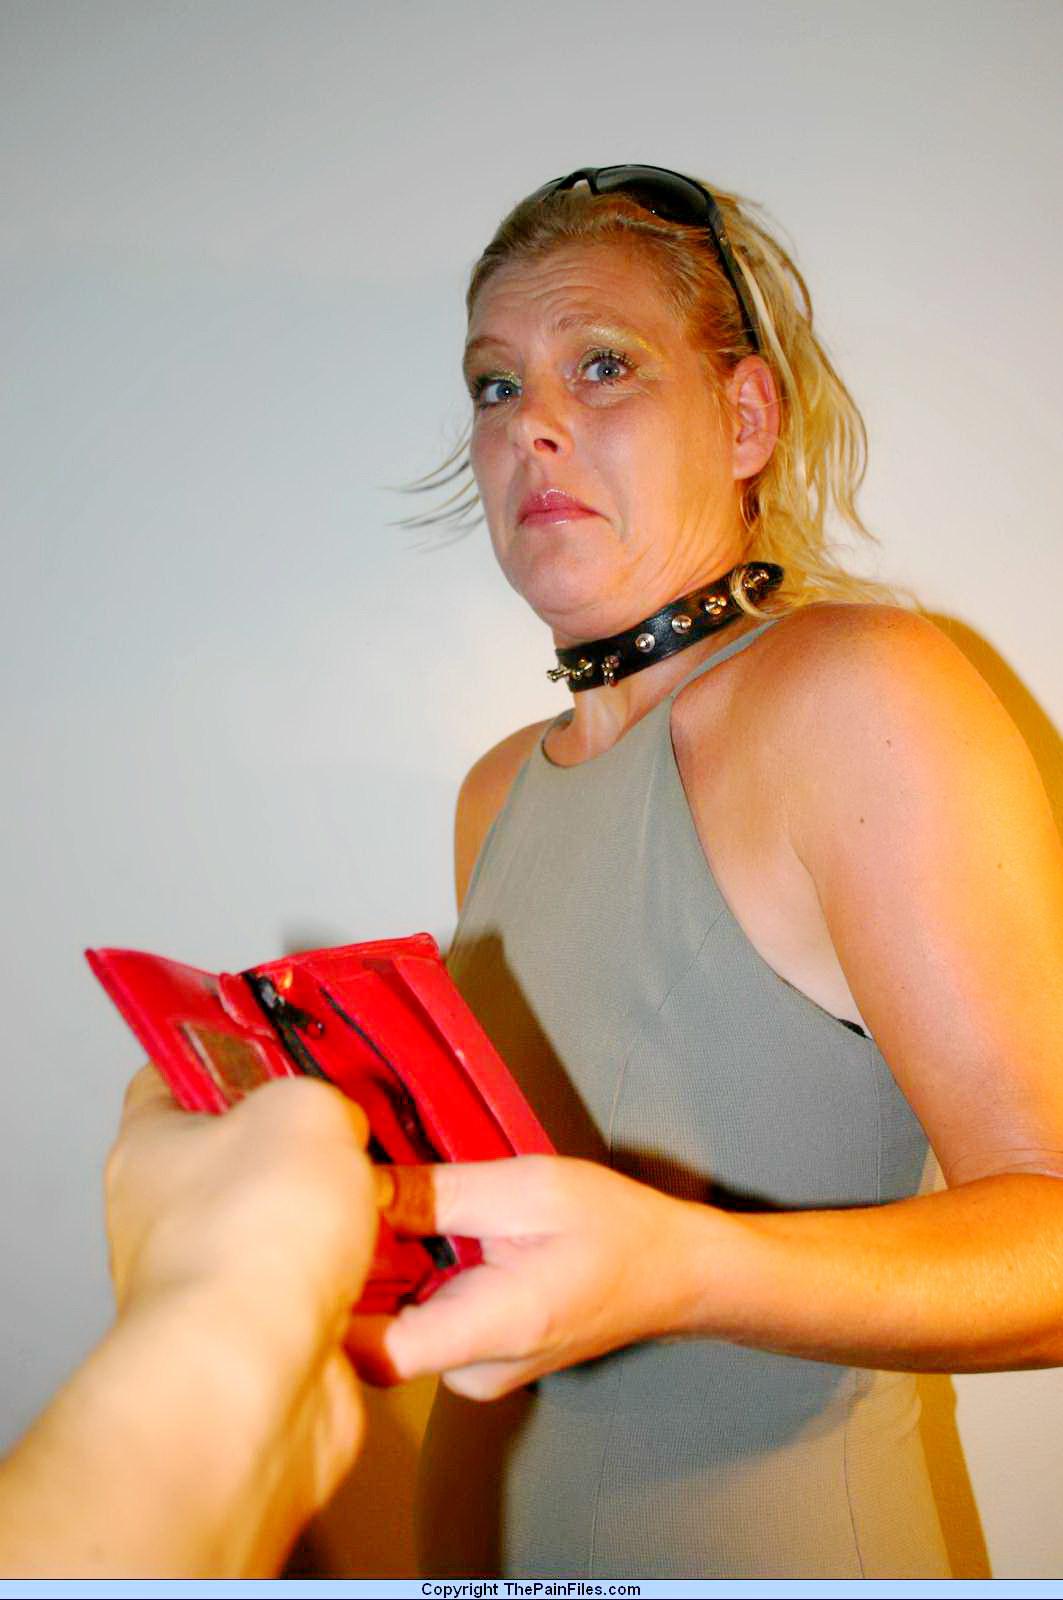 Sexy dress of women